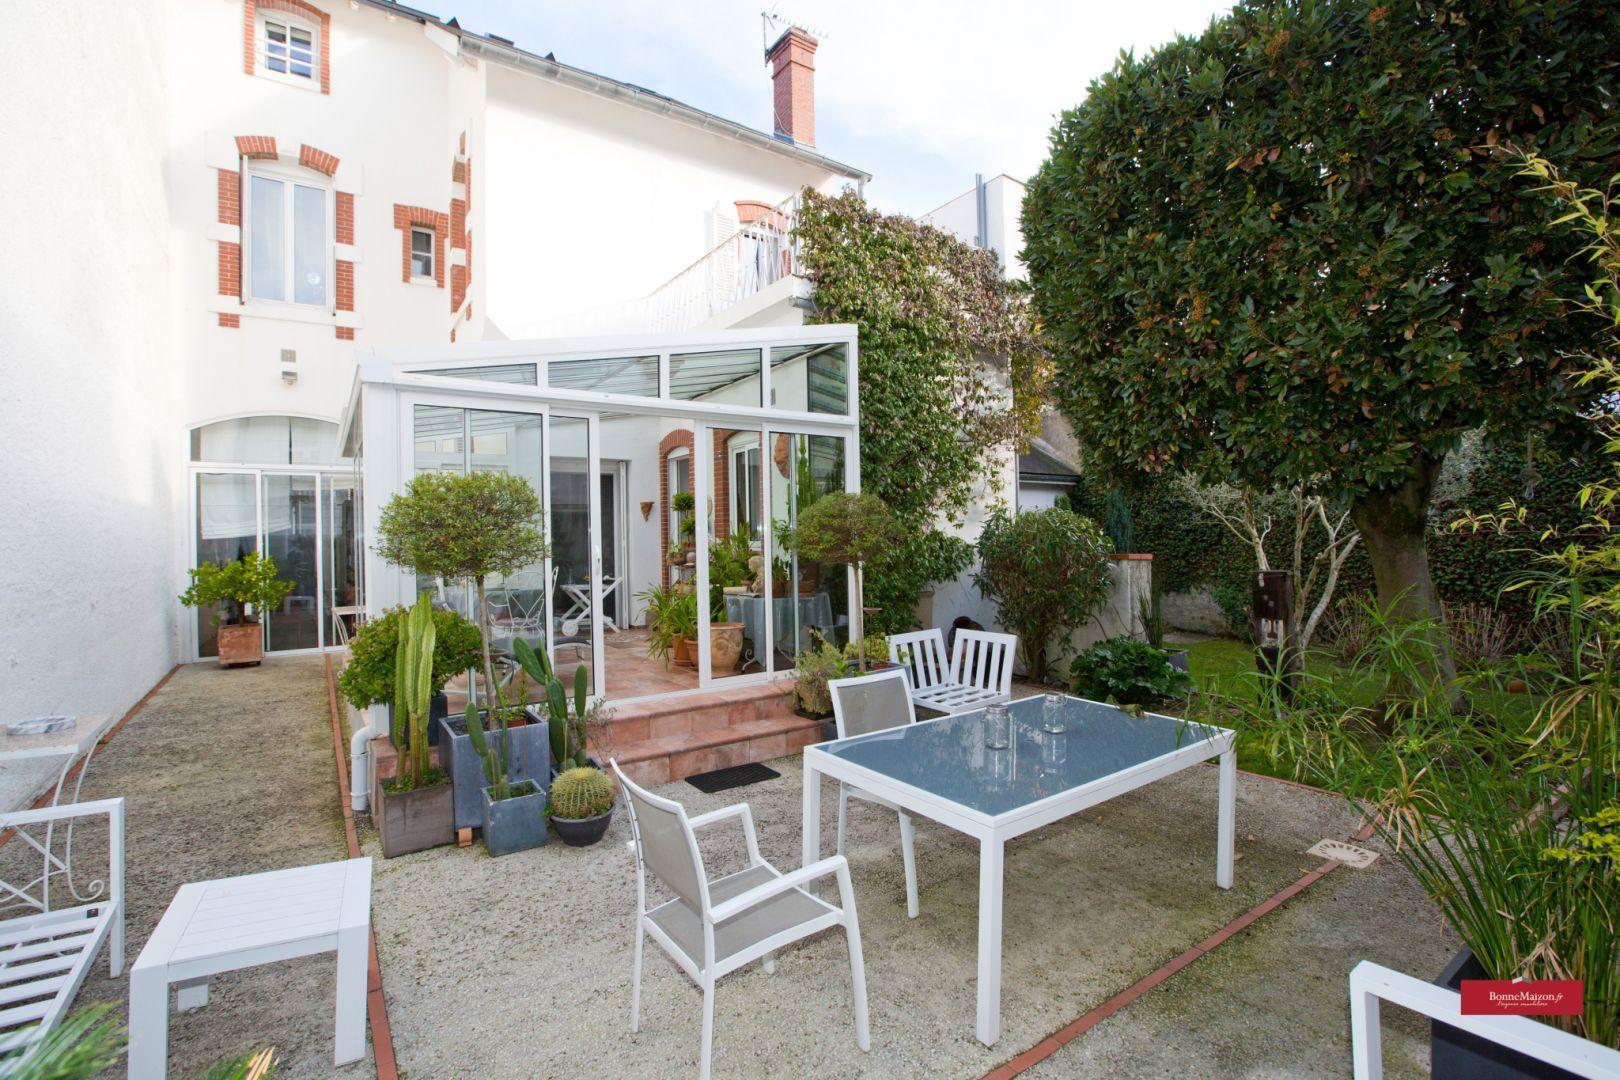 Vente de prestige maison / villa Tarbes 525000€ - Photo 1